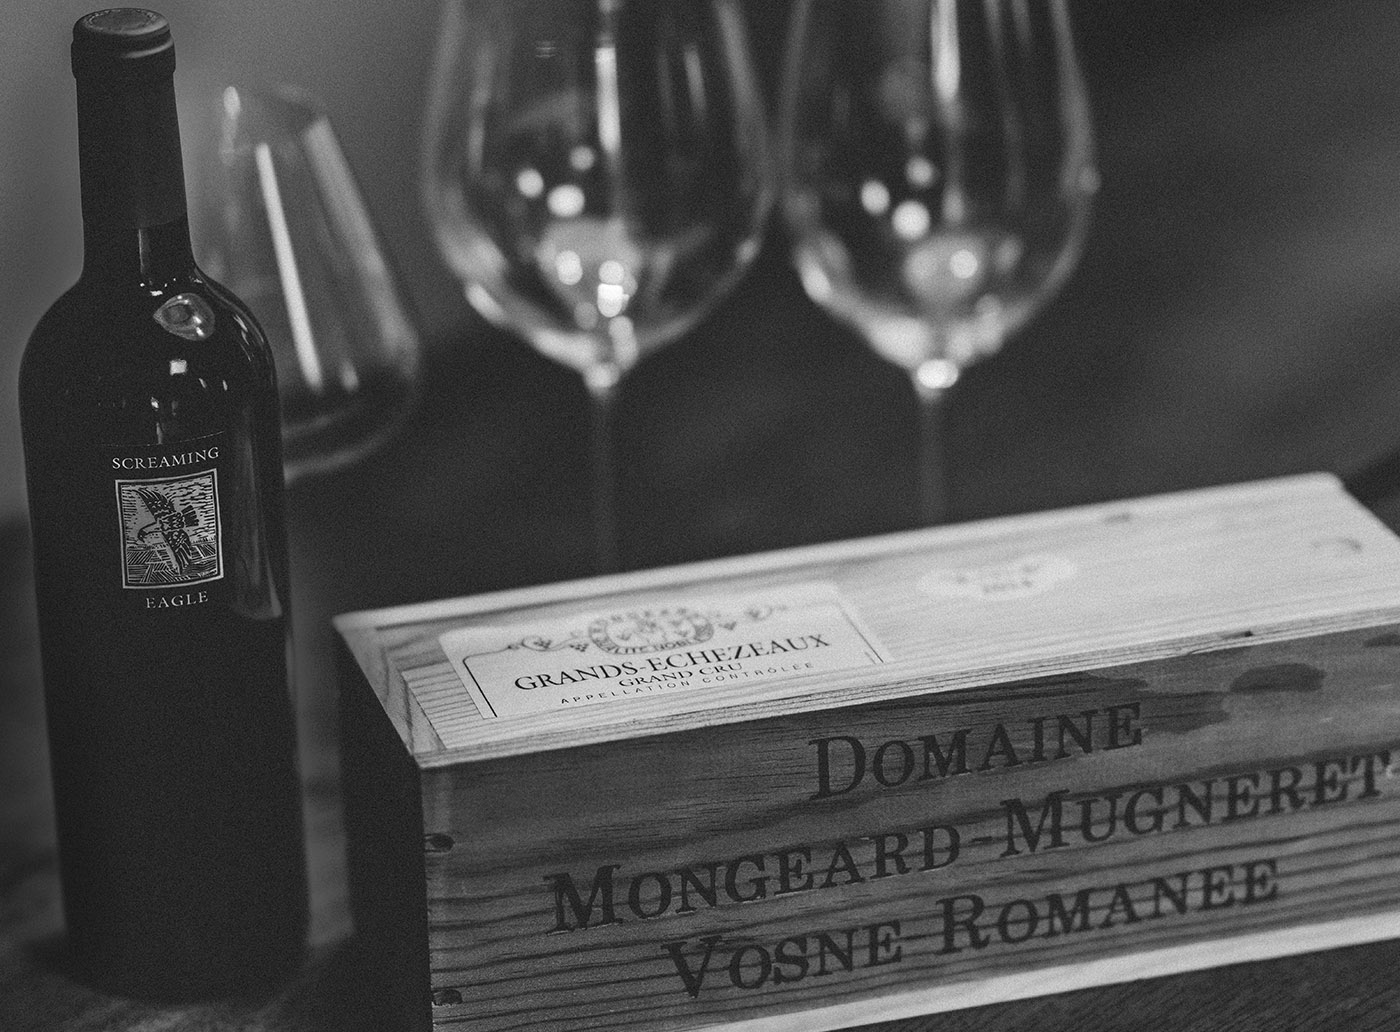 Screaming Eagle and Mongeard Mugneret Grands Echezeaux wines